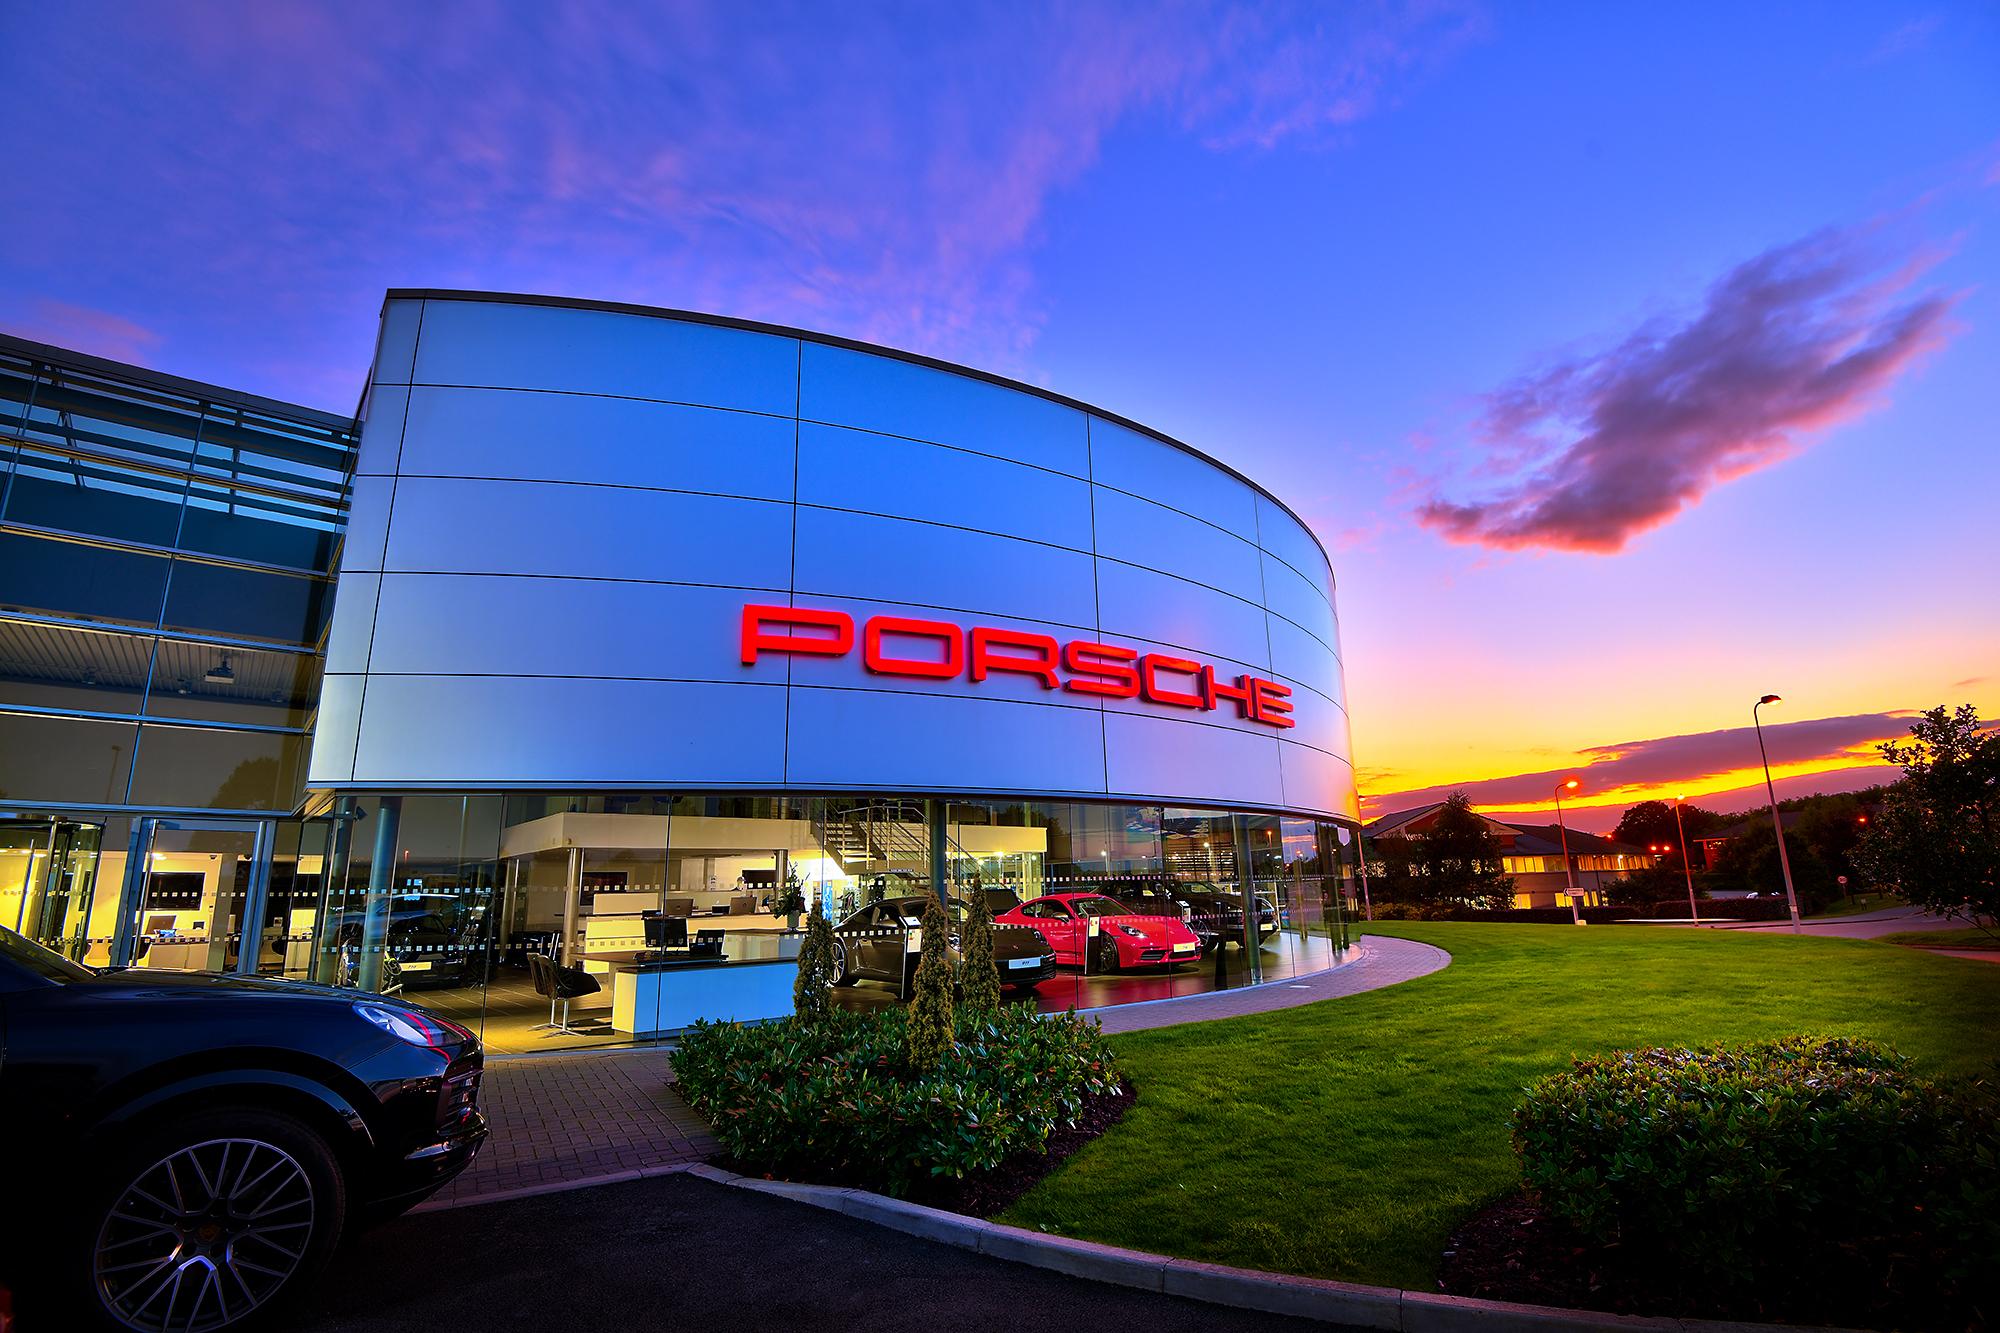 HDR photographic image - Porsche 6